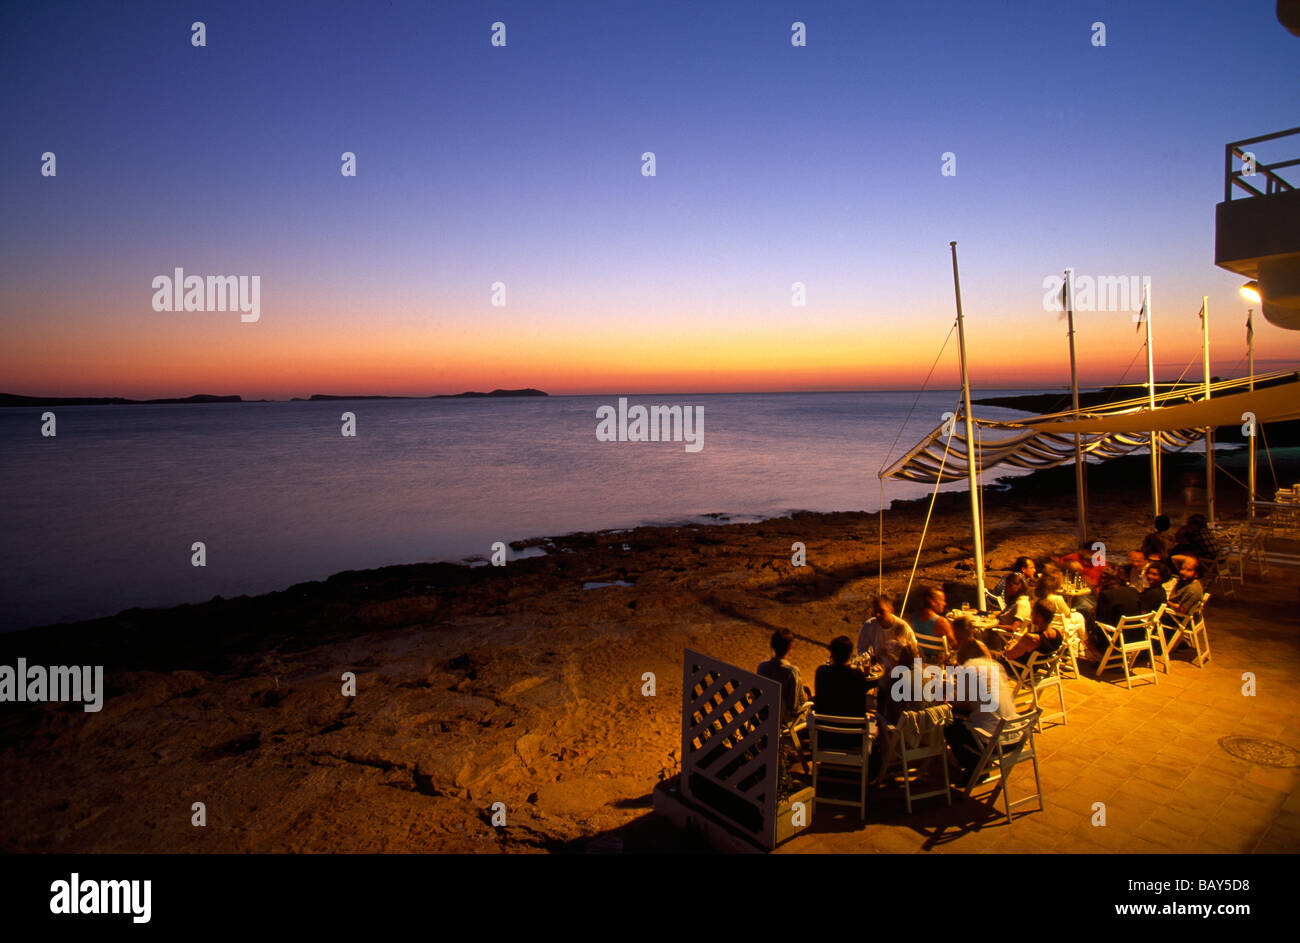 Cafe del Mar at sunset, San Antoni, Ibiza, Spain - Stock Image